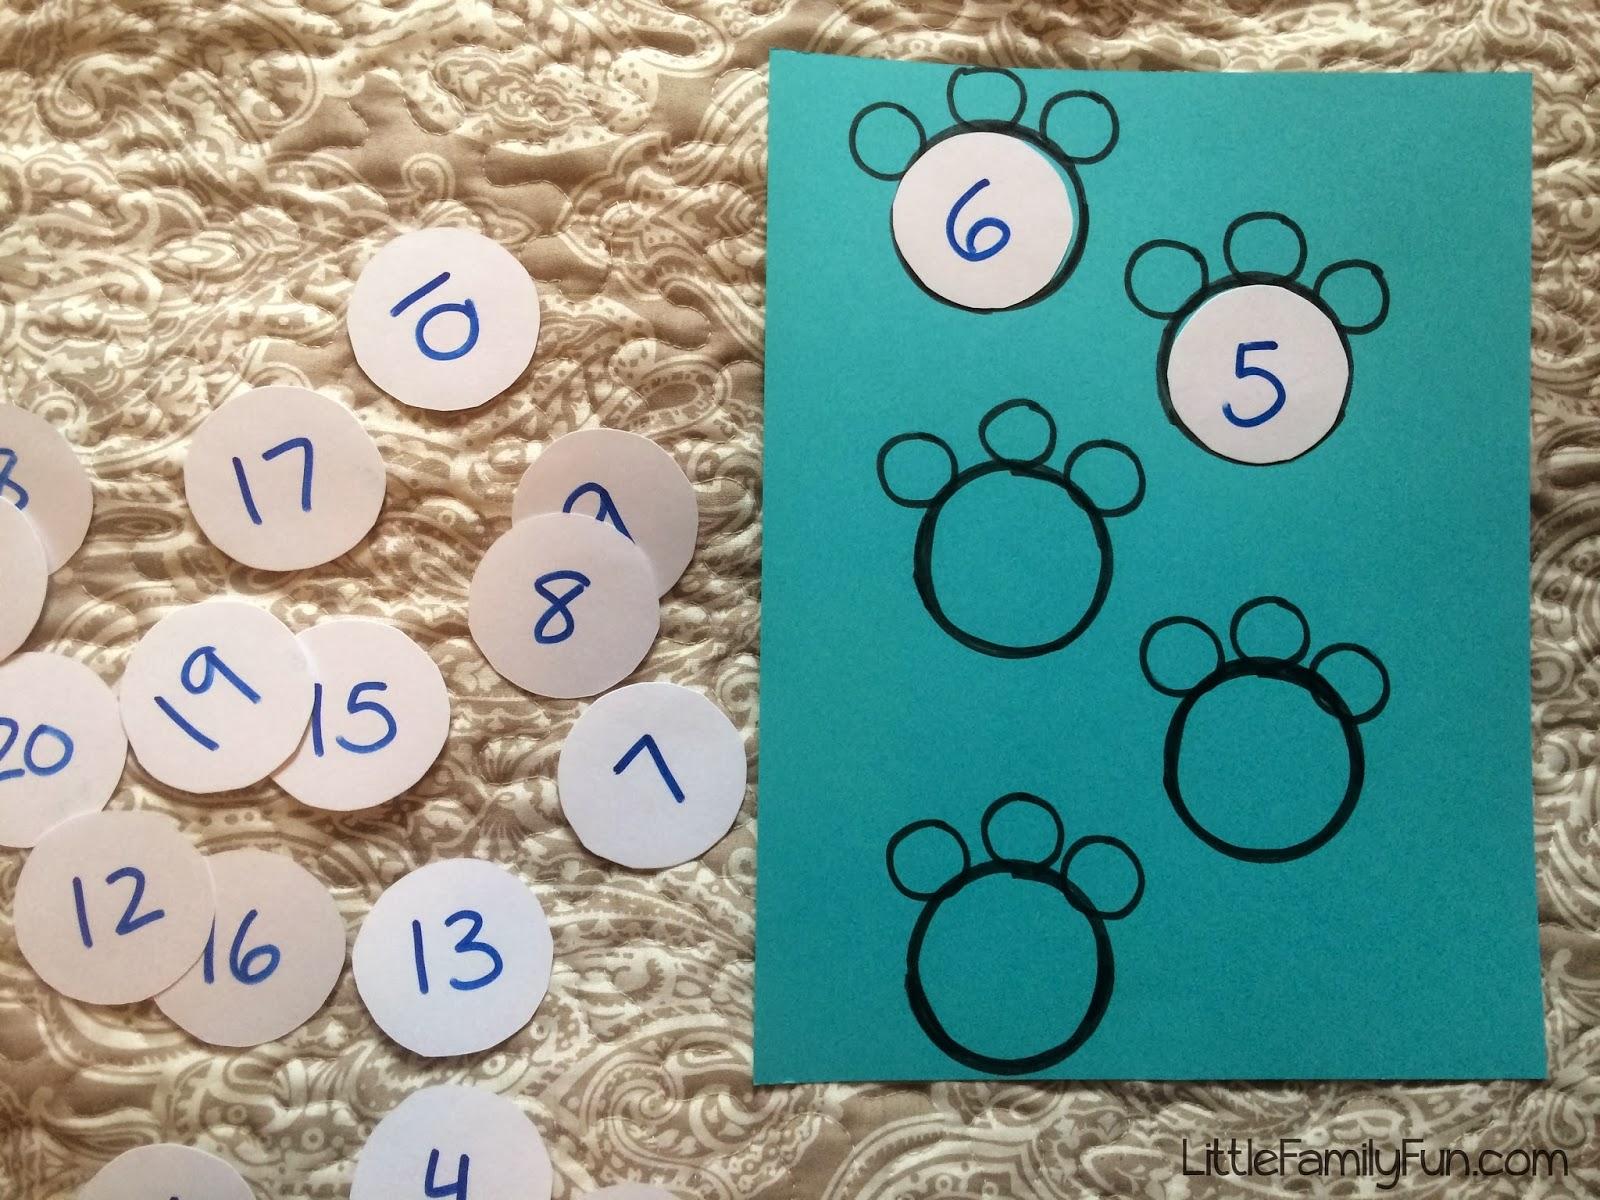 Little Family Fun Polar Bear Paw Counting